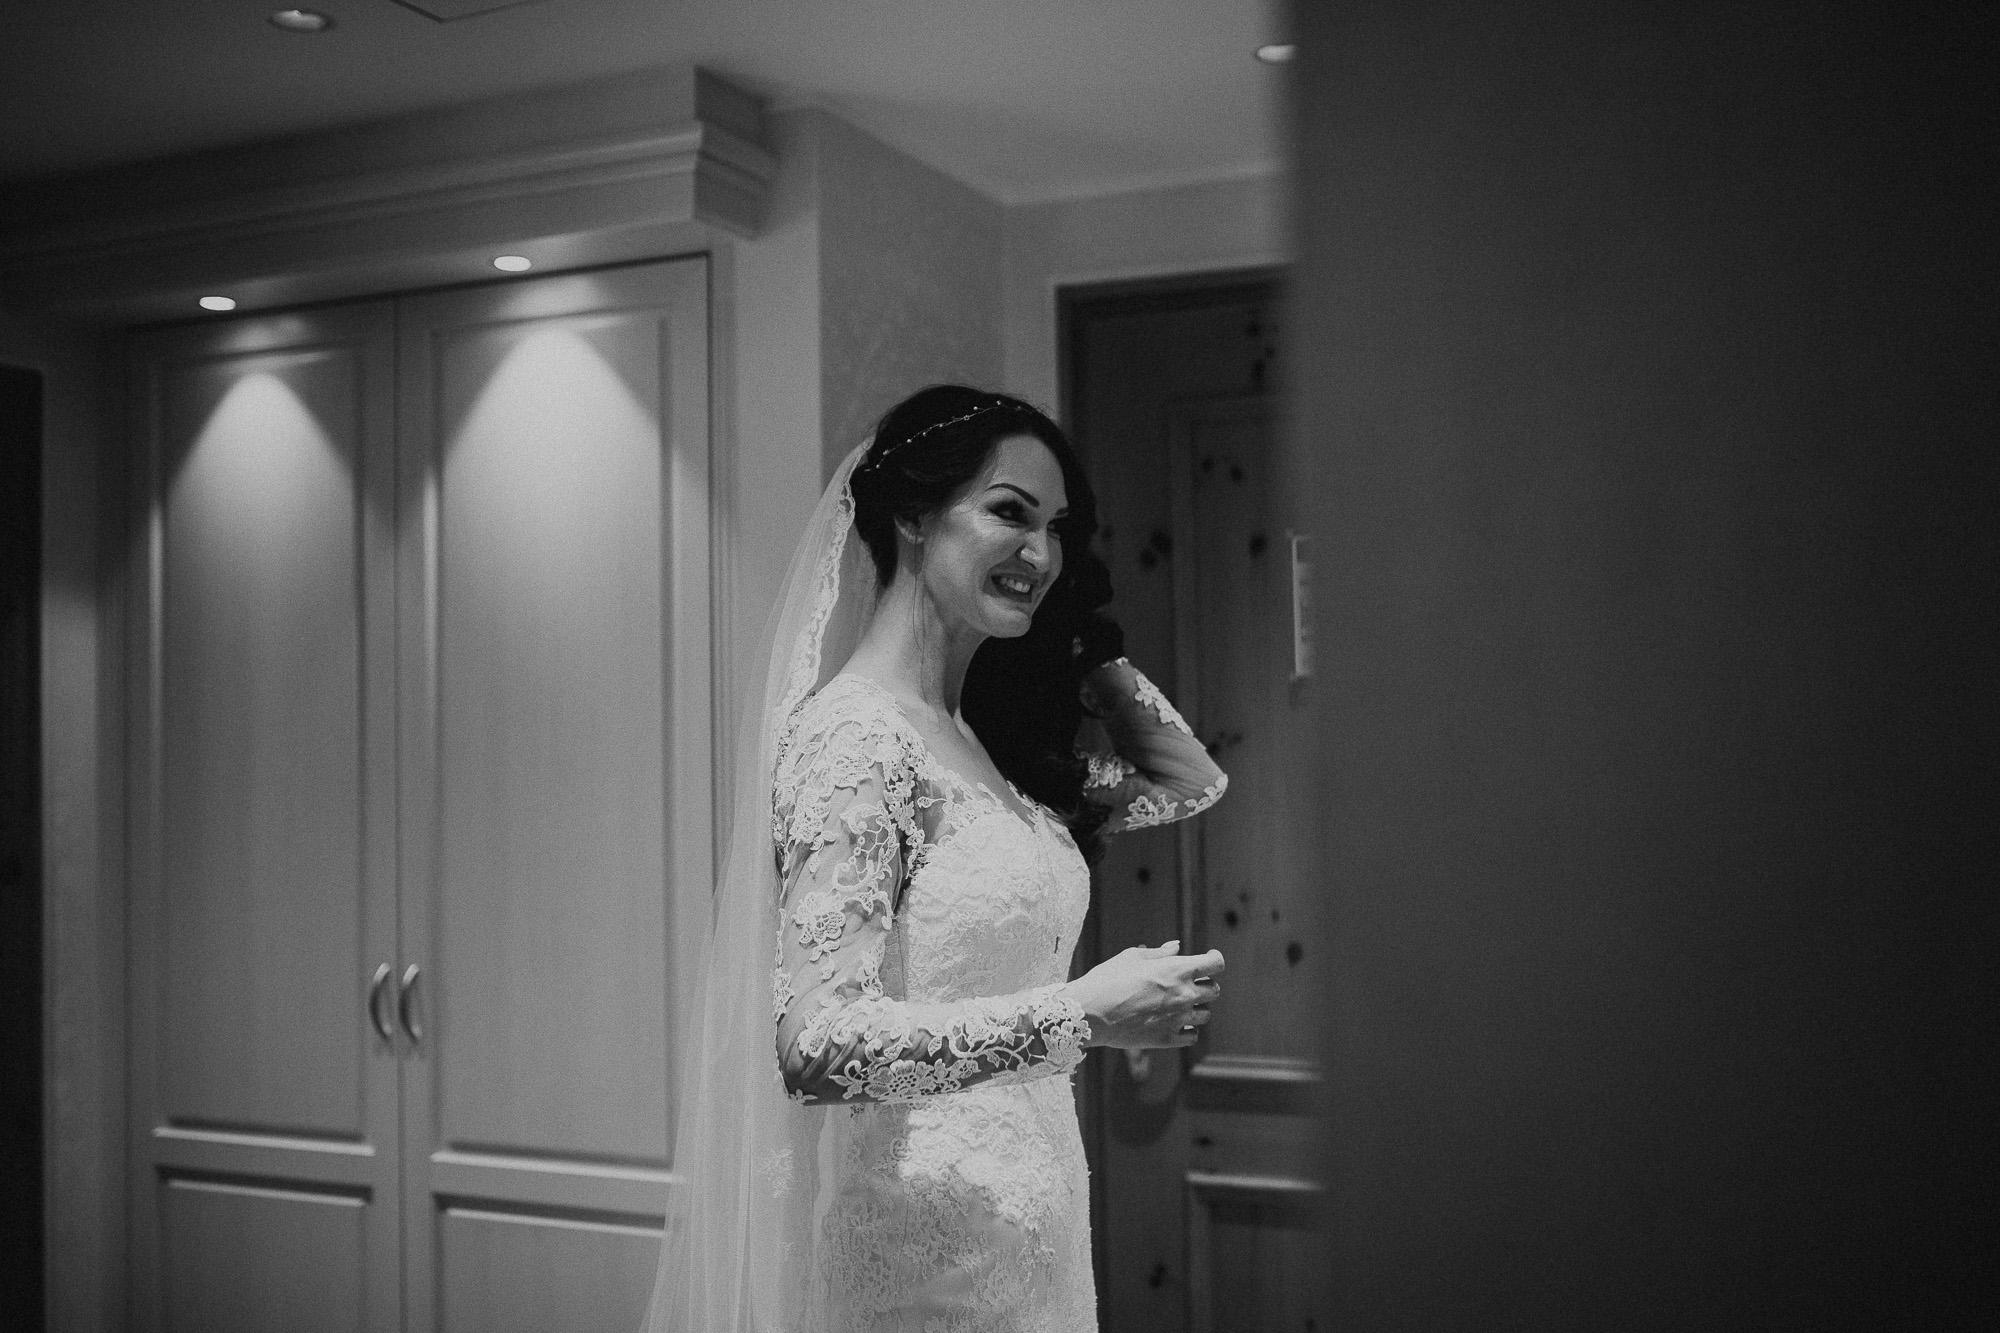 DanielaMarquardtPhotography_Hochzeitsfotograf_Düsseldorf_Köln_Mallorca_Bayern_Austria_Harz_Wedding_AileenundLennart_Weddingphotographer_Ibiza_Tuskany_Italien_Toskana_Portugal_Lissabon50